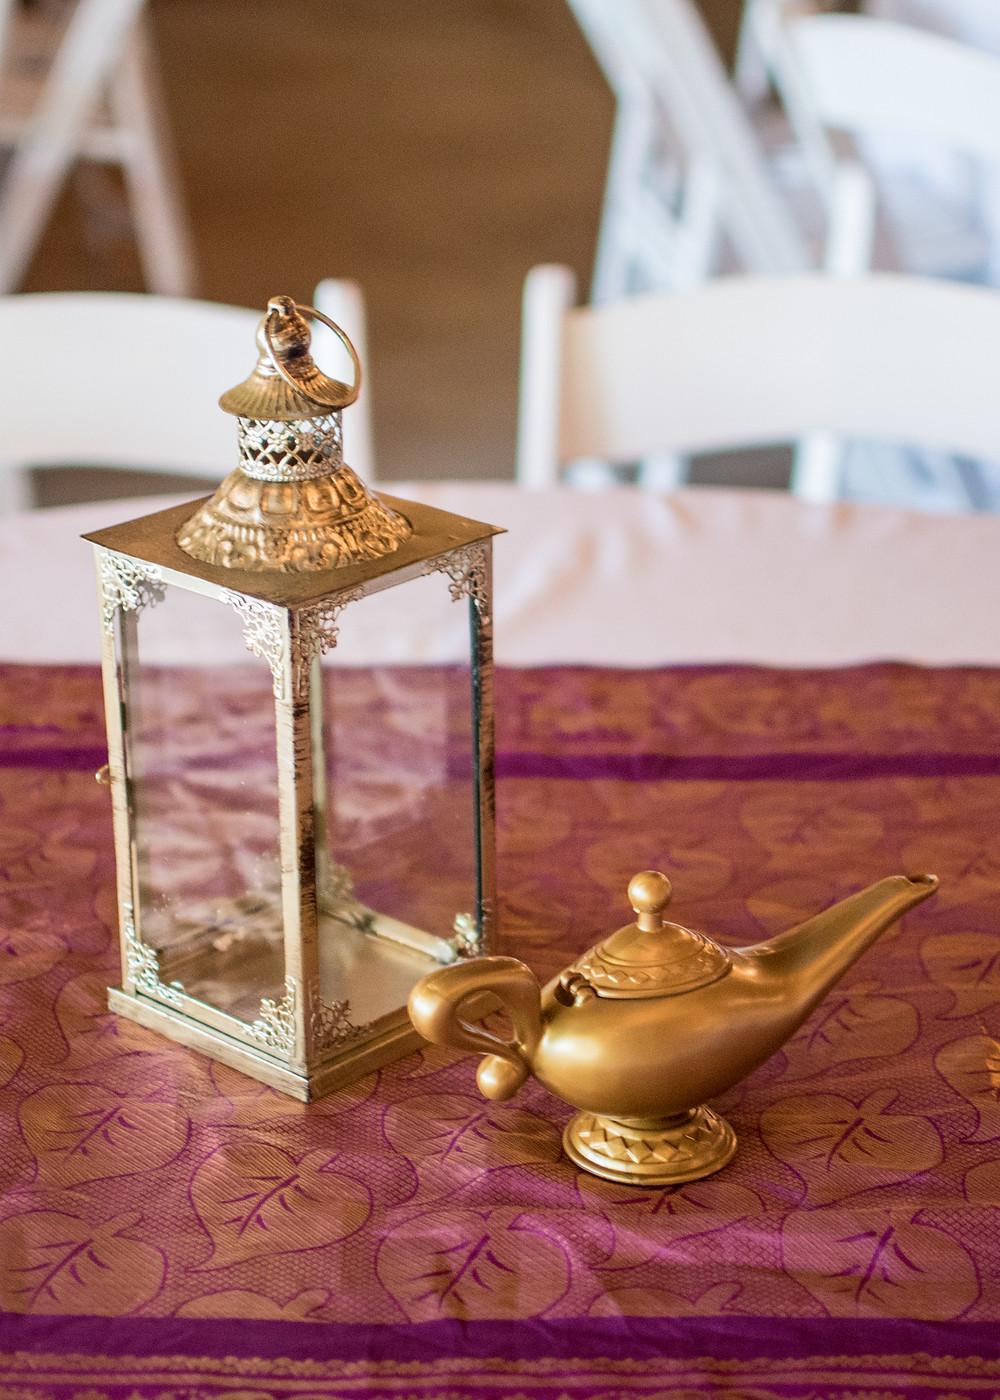 A DIY, Disney-Inspired Wedding at rustic venue Swans Trail Farms, a wedding venue in Snohomish near Seattle, WA. | My Snohomish Wedding | Snohomish Wedding Planning